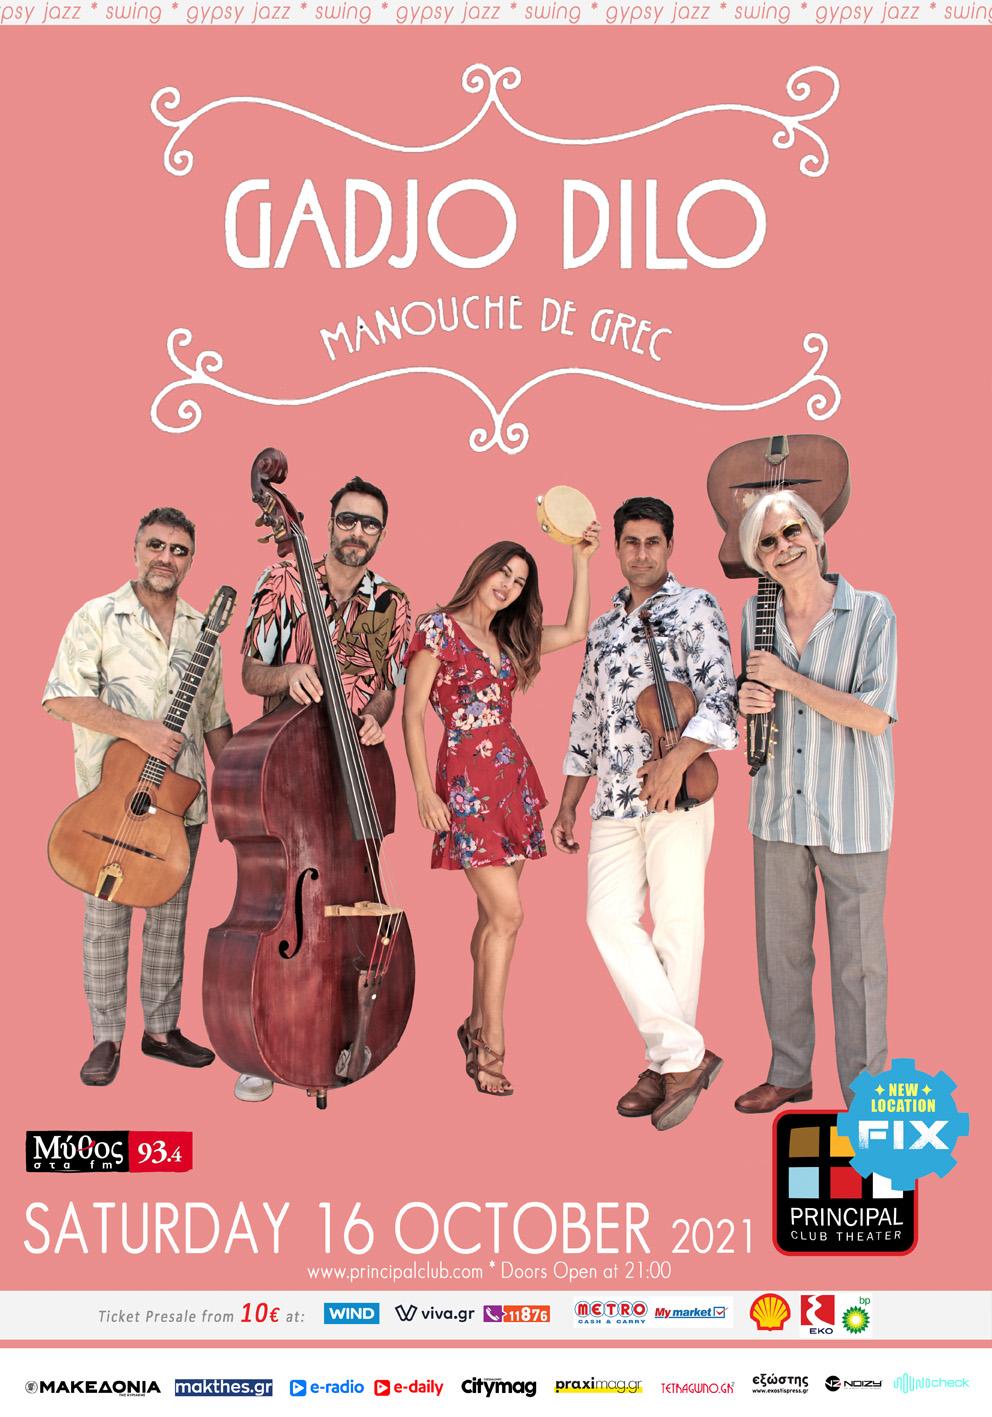 Gadjo Dilo Live